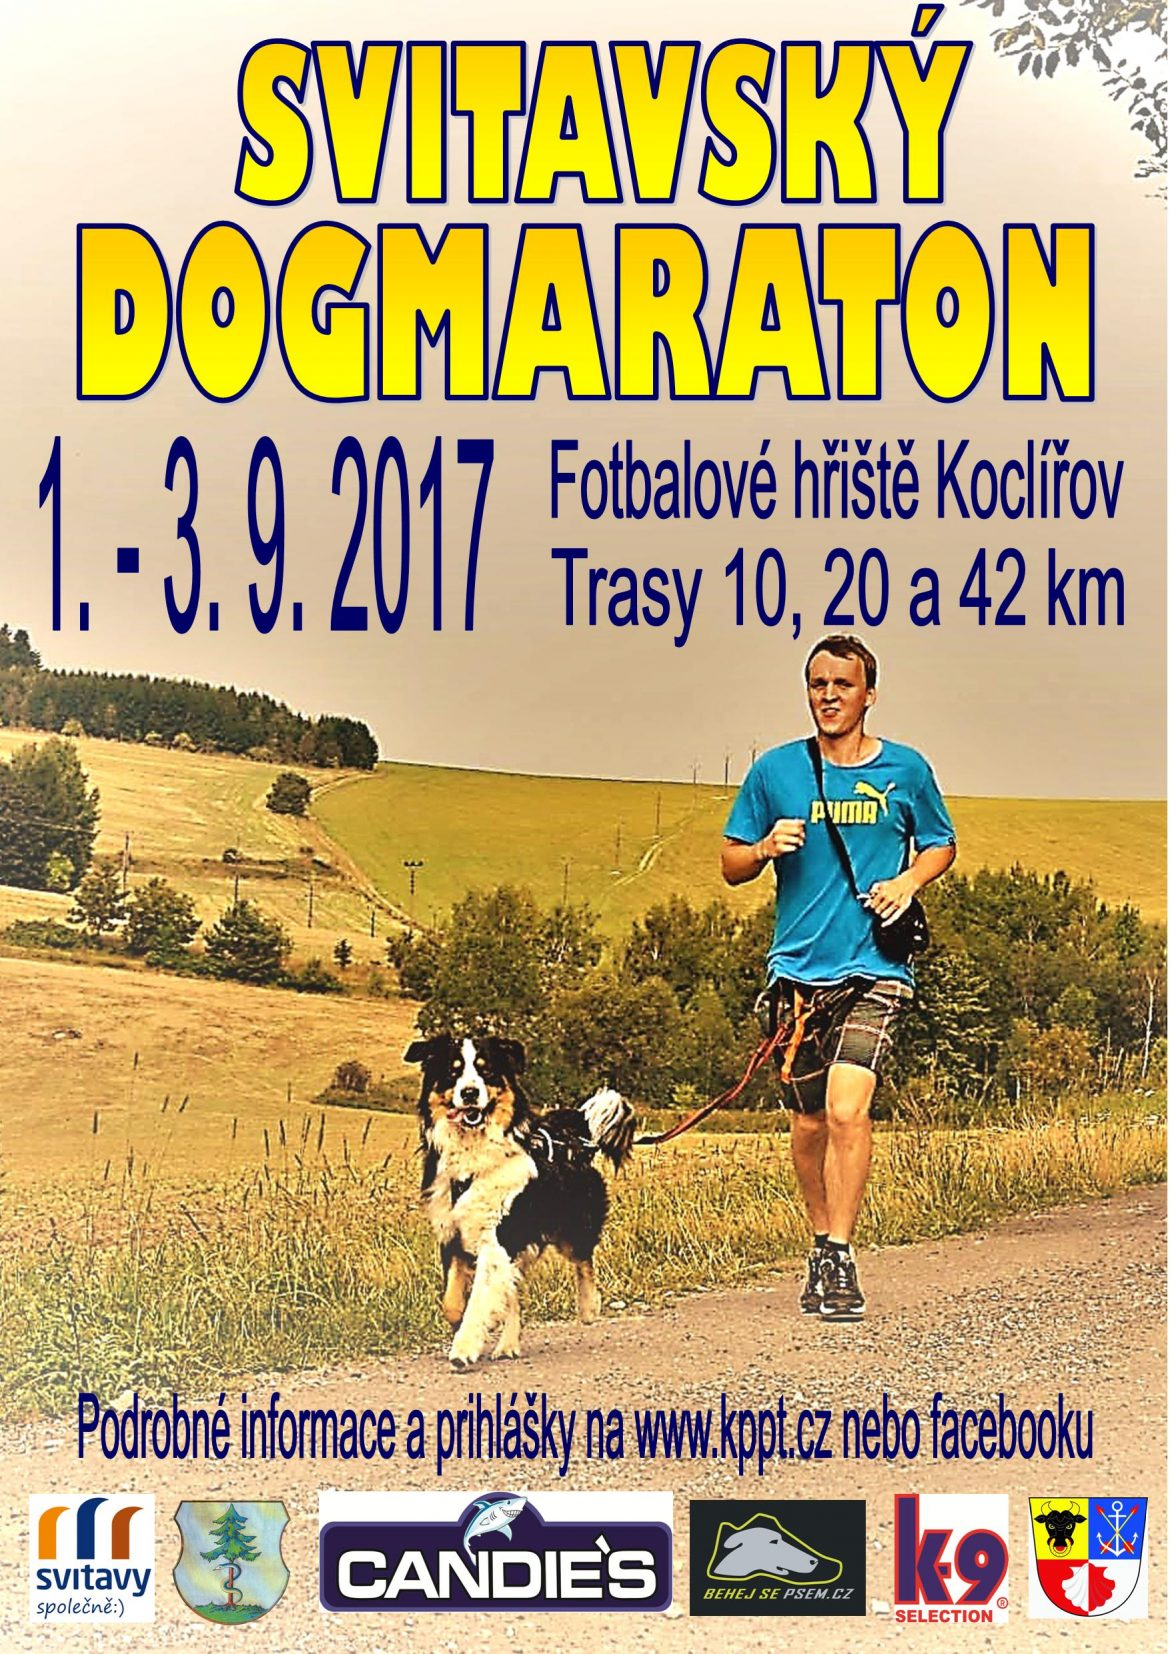 dogmaraton 2017 plakát(1)